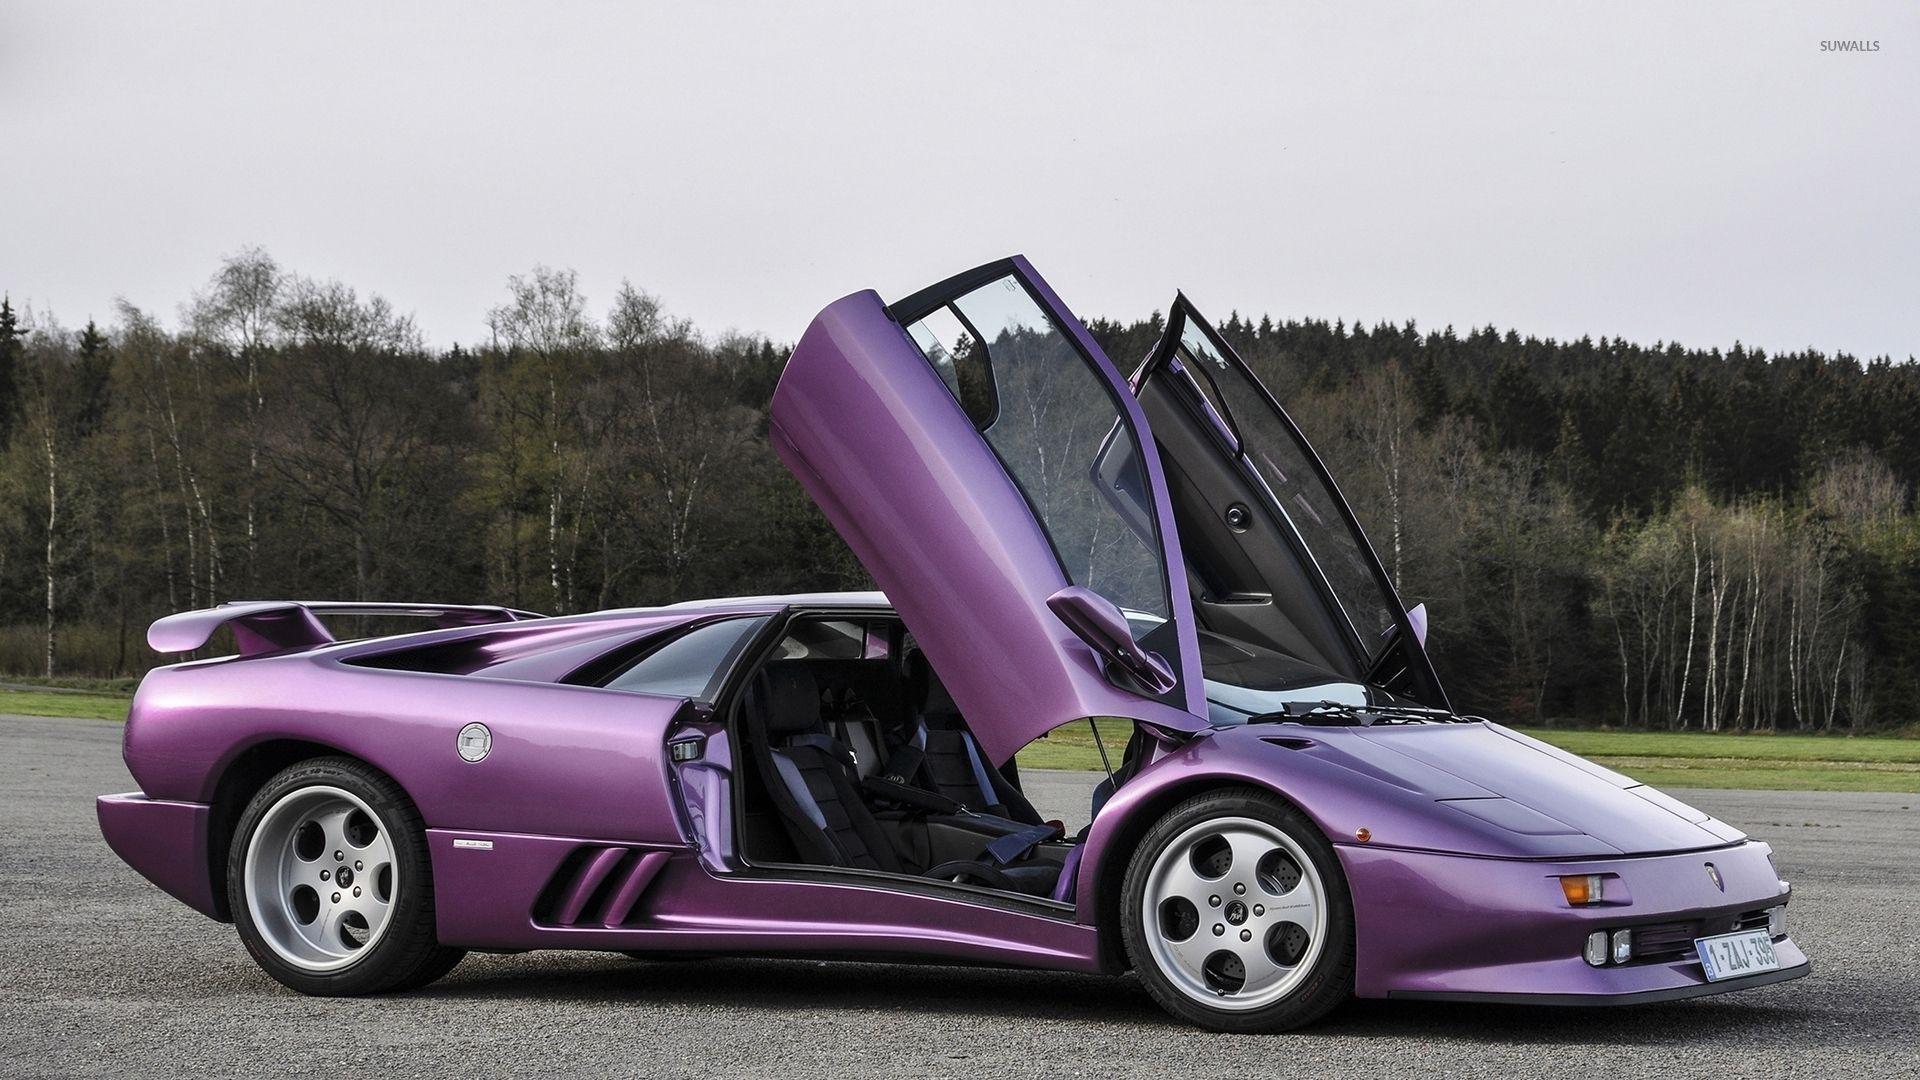 Lamborghini Diablo Wallpapers Top Free Lamborghini Diablo